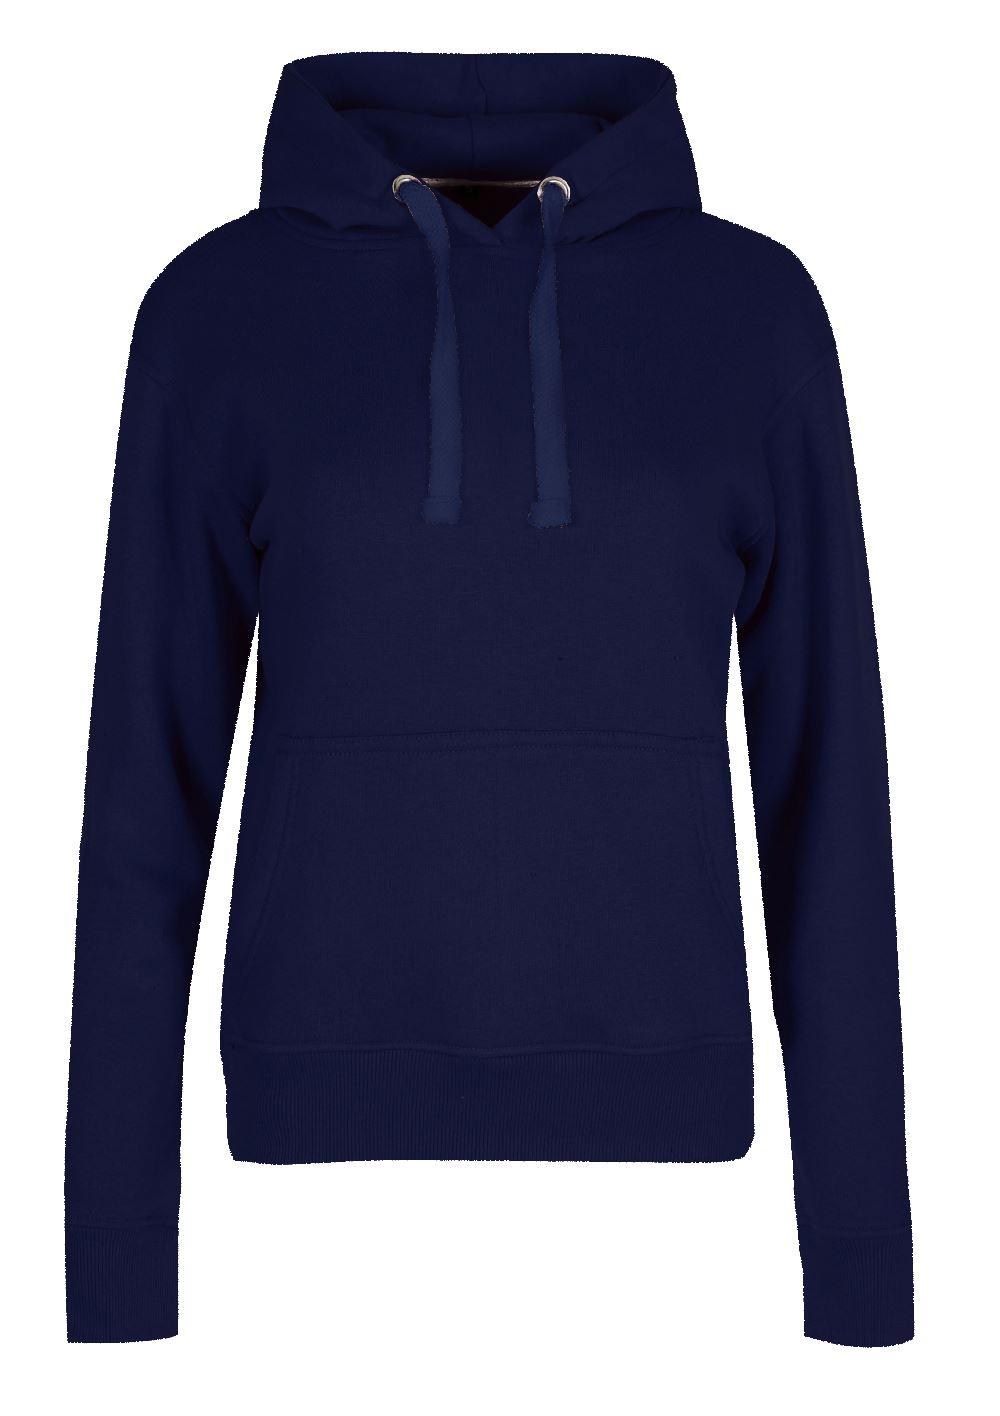 Womens Hoodies Ladies Long Sleeve Fleece Knit Side Pockets Jumper Top Sweatshirt